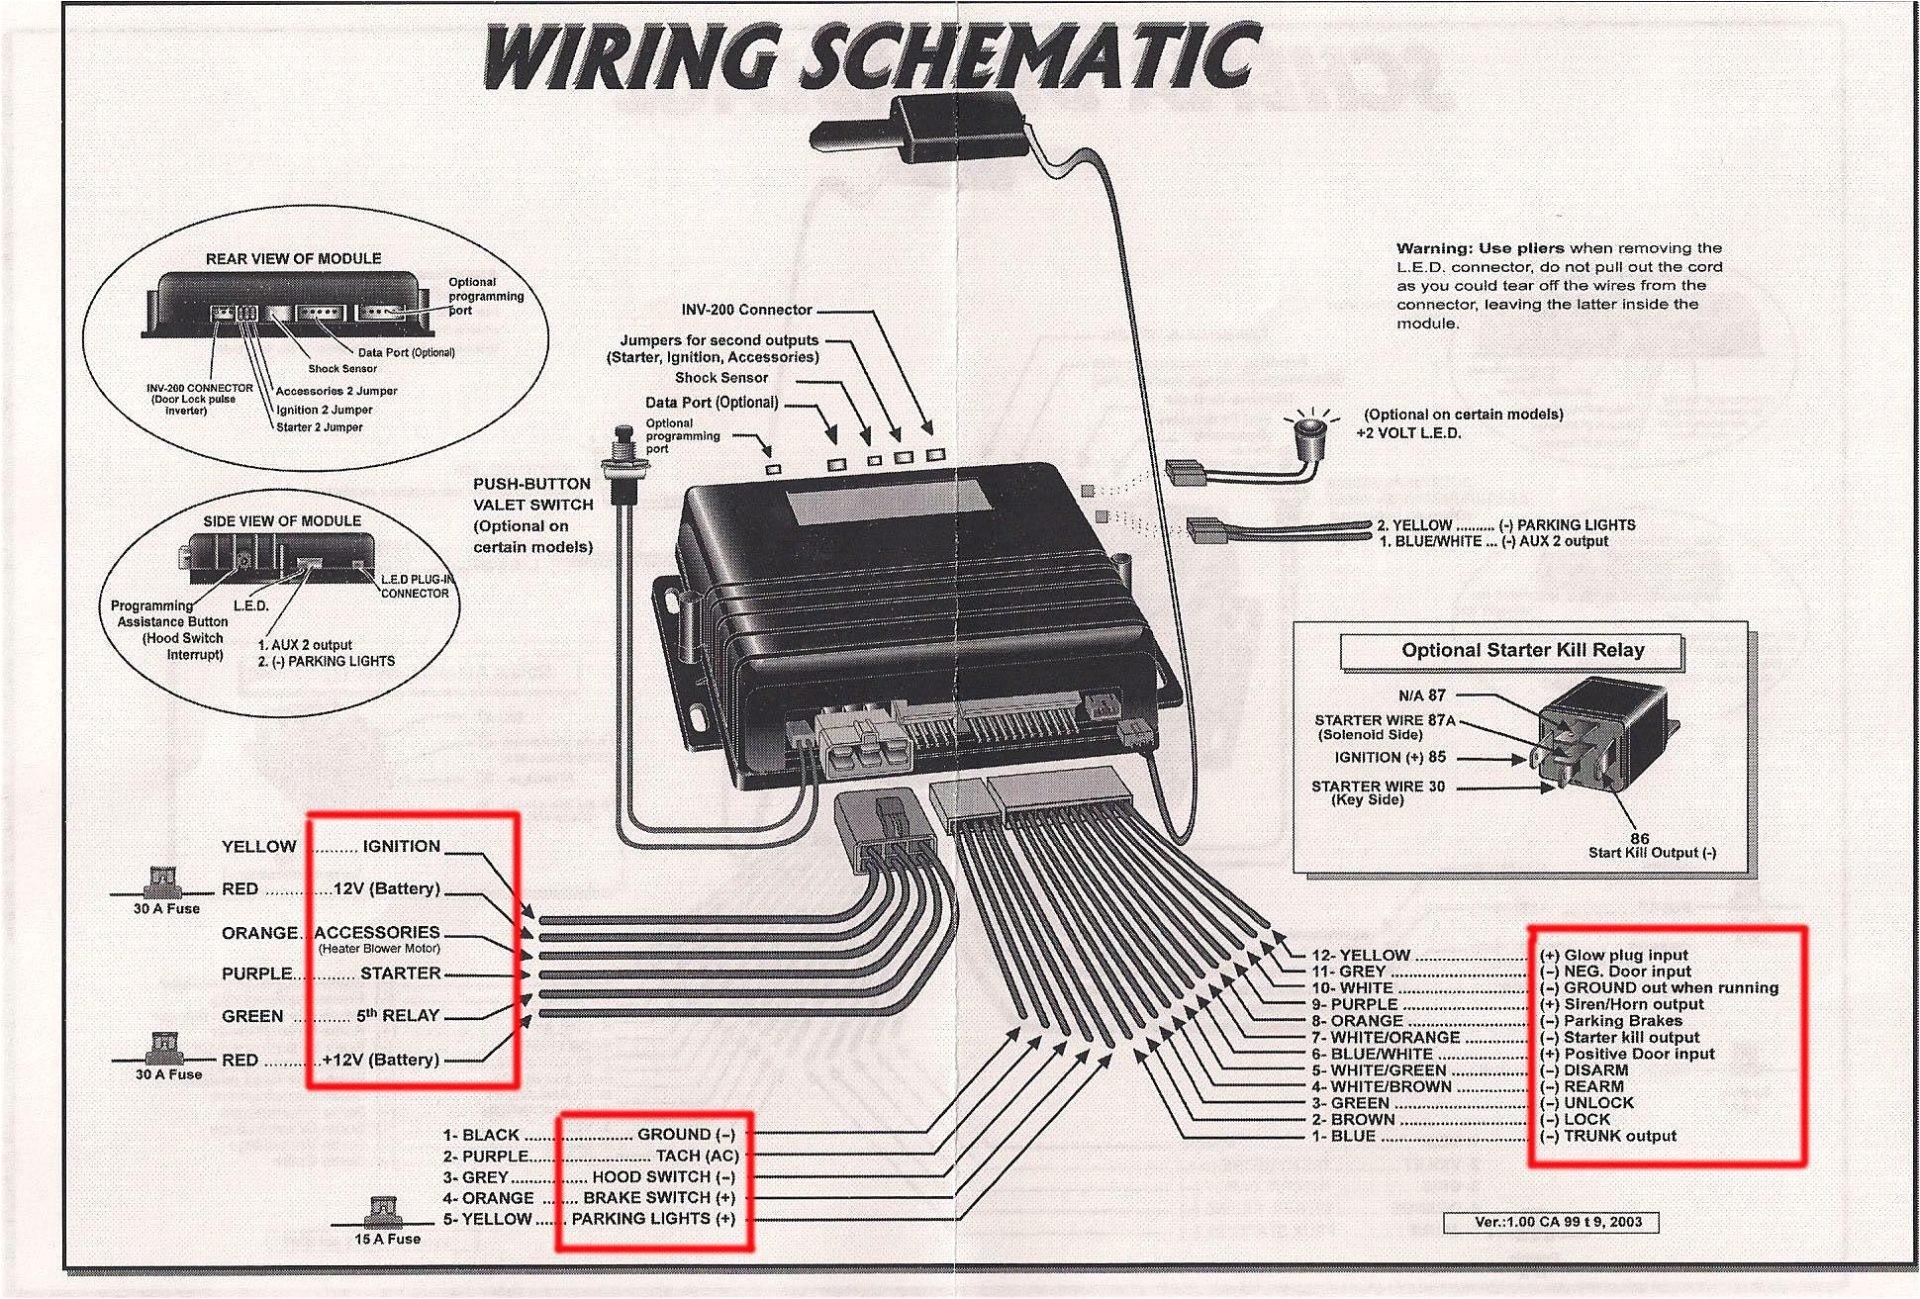 beret car alarm wiring diagram wiring diagram optionshero car alarm wiring diagram wiring diagram value beret